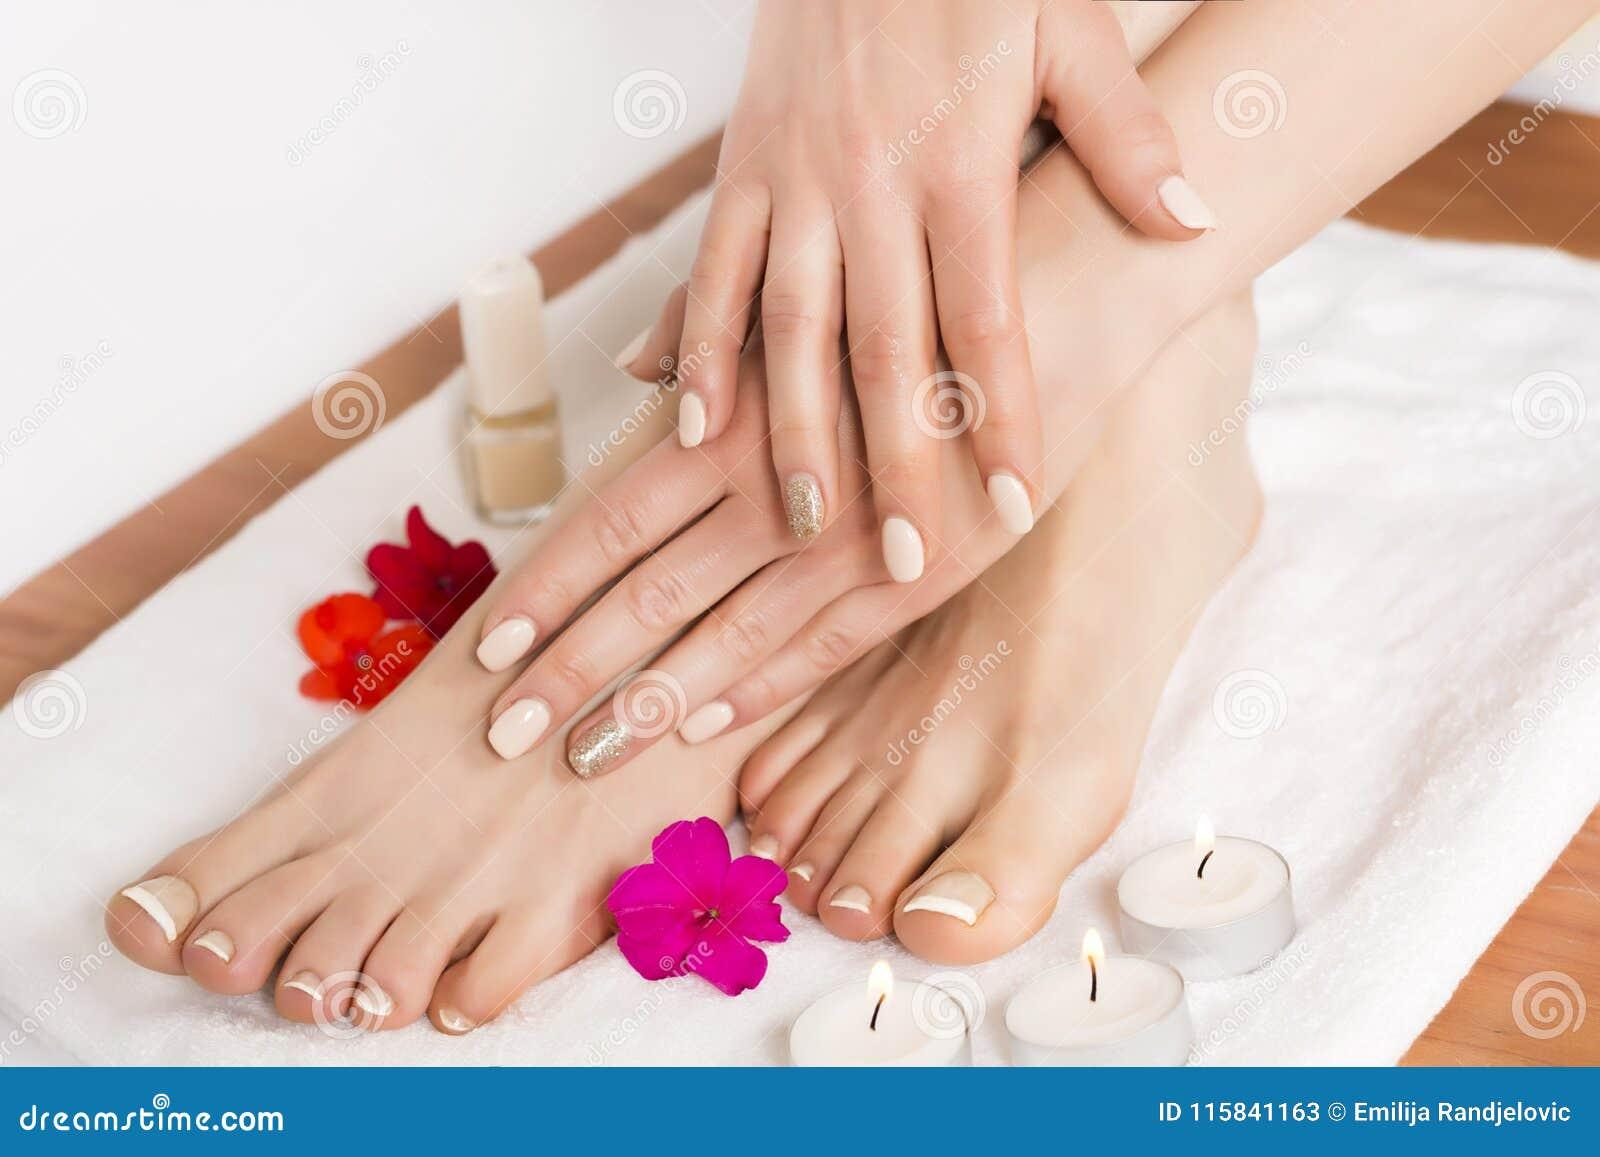 Ноги и руки красоты женские на салоне курорта на процедуре по pedicure и цветках и свечах на белом полотенце